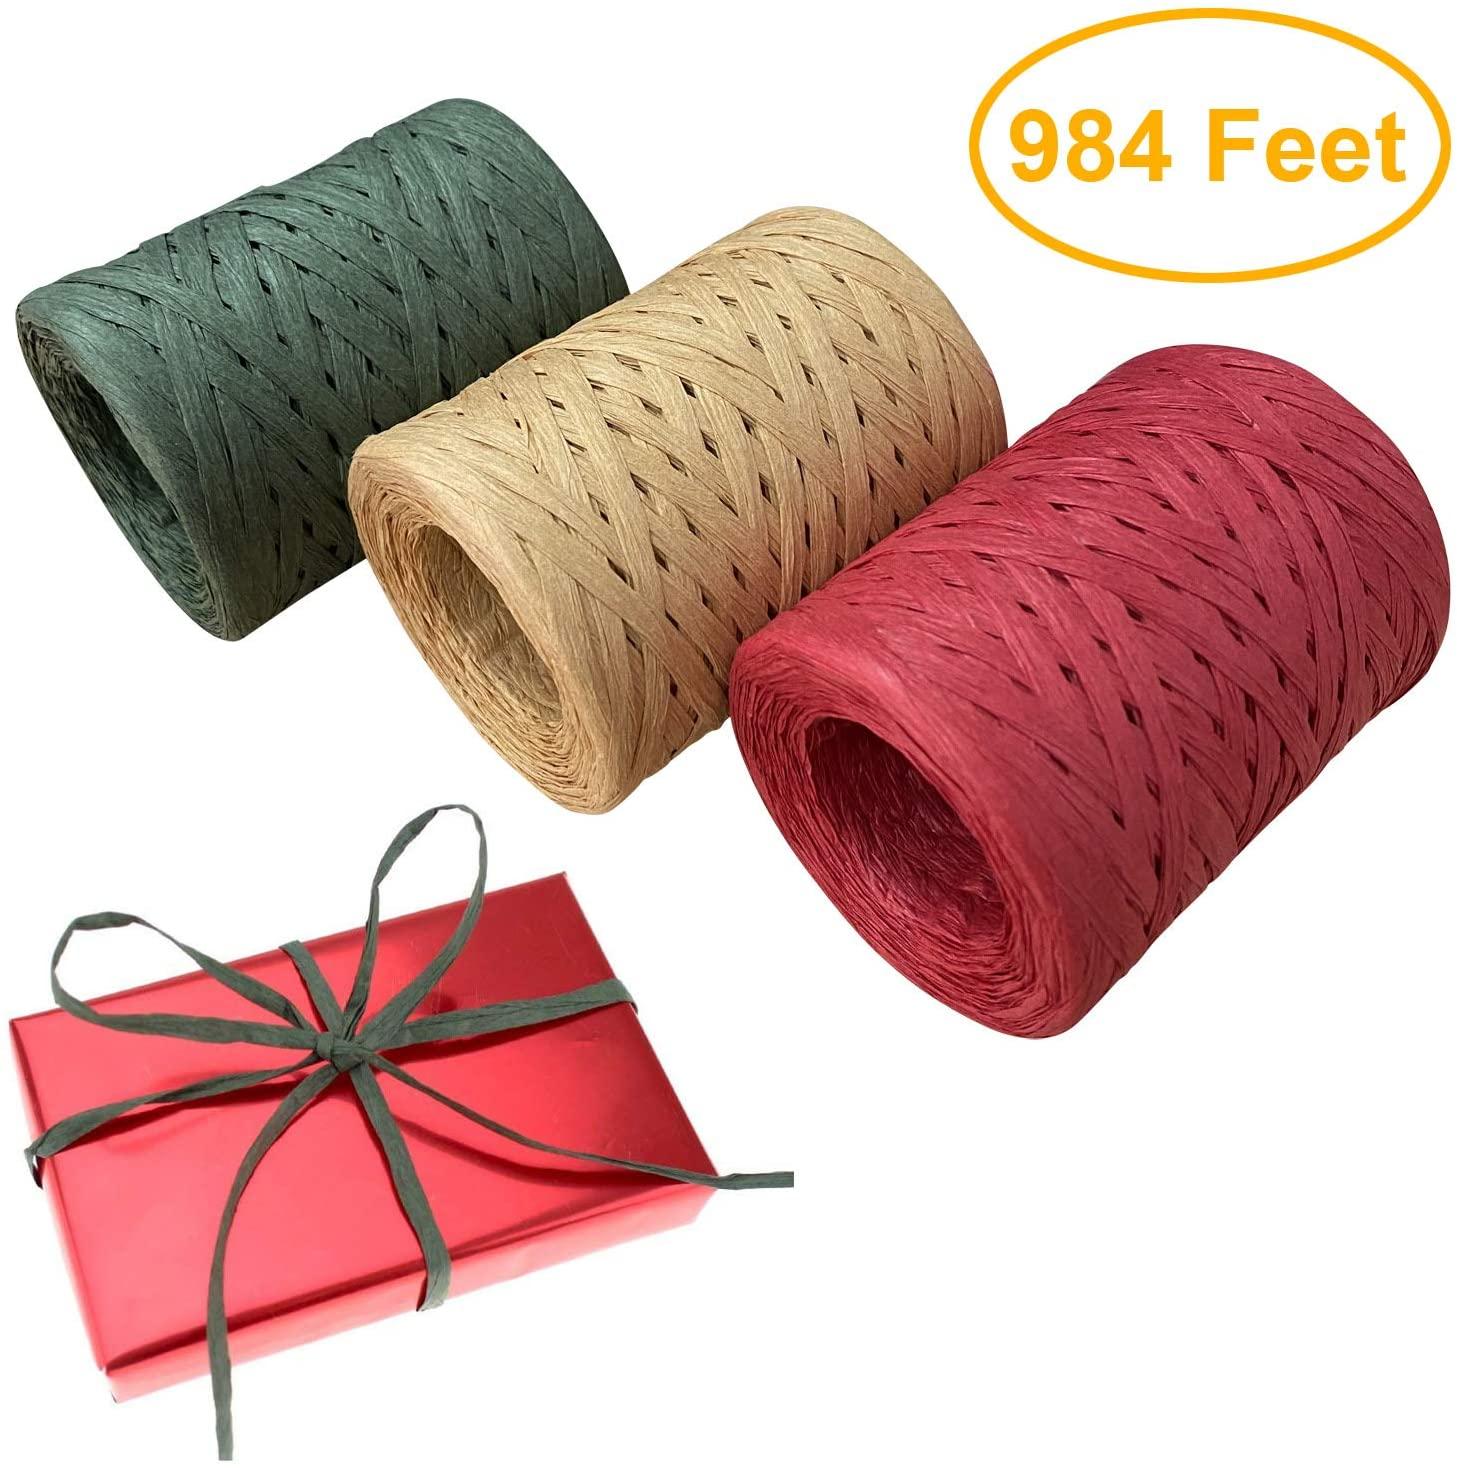 Vancool Raffia Ribbon String, 3 Rolls 984 Feet Red Green Kraft, Packing Paper Twine for Christmas, 328 Feet Each Roll